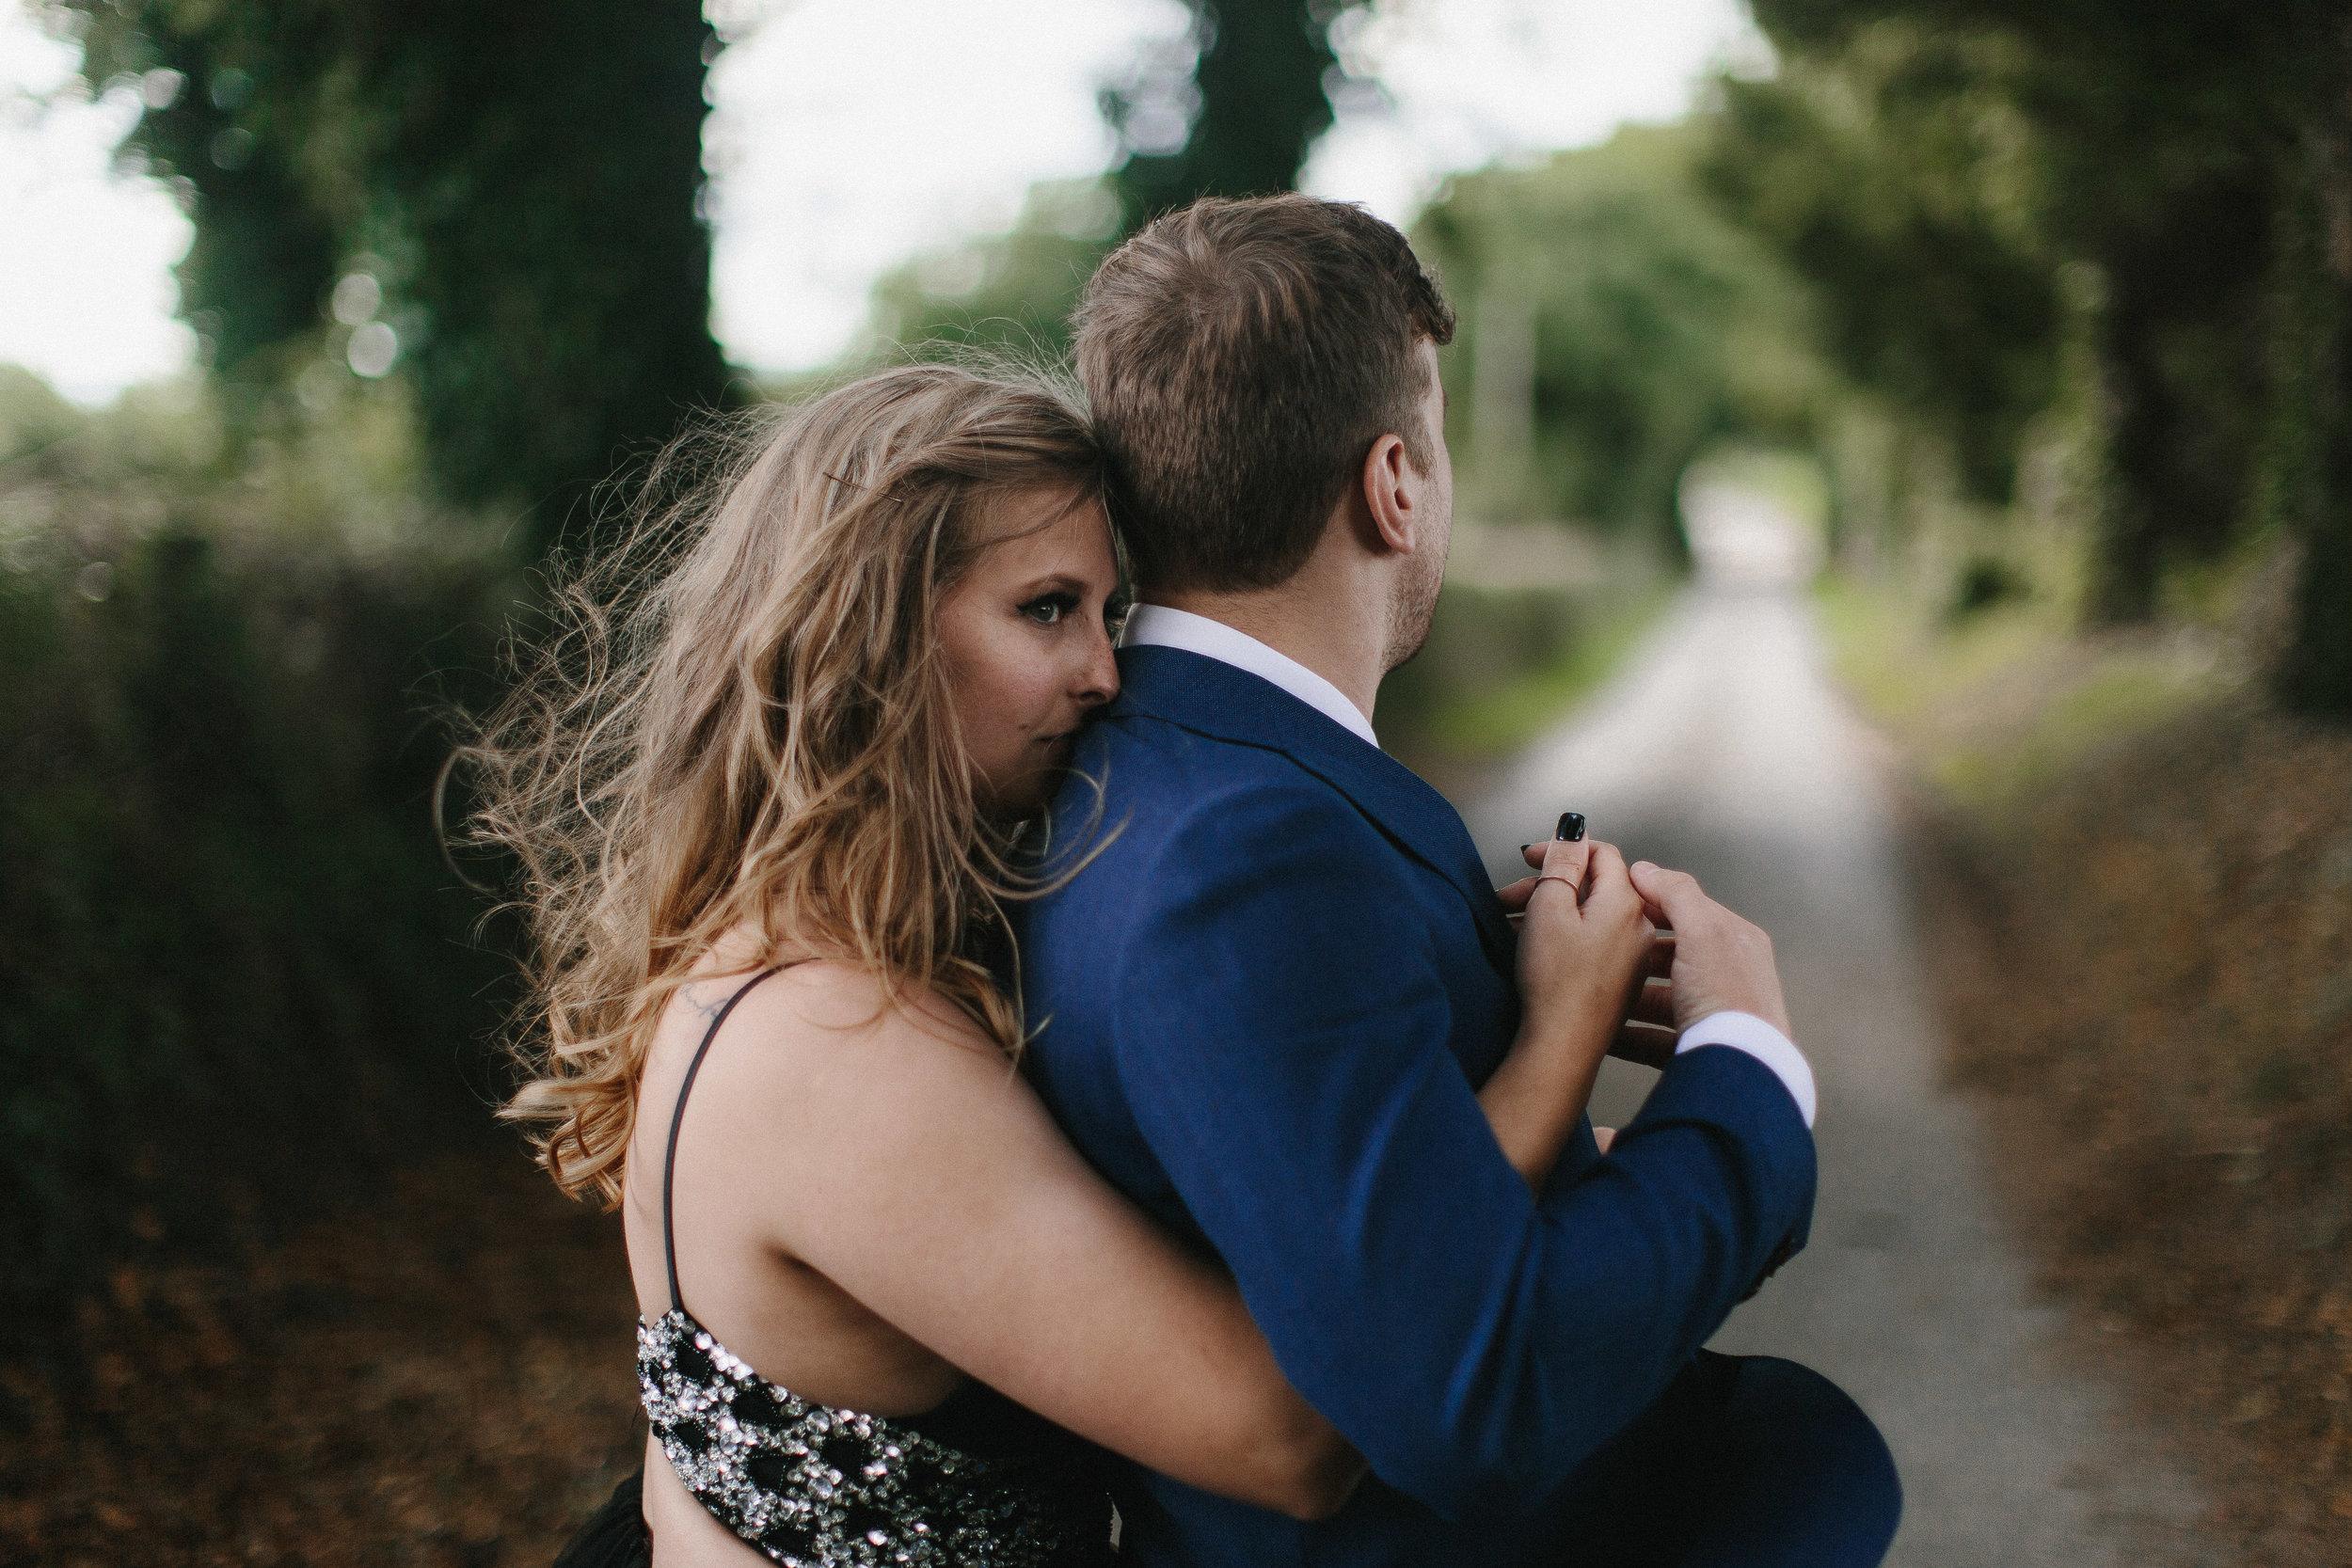 ireland_elopement_black_wedding_dress_wicklow_glendalough_athy_st_kevins_way_1676.jpg